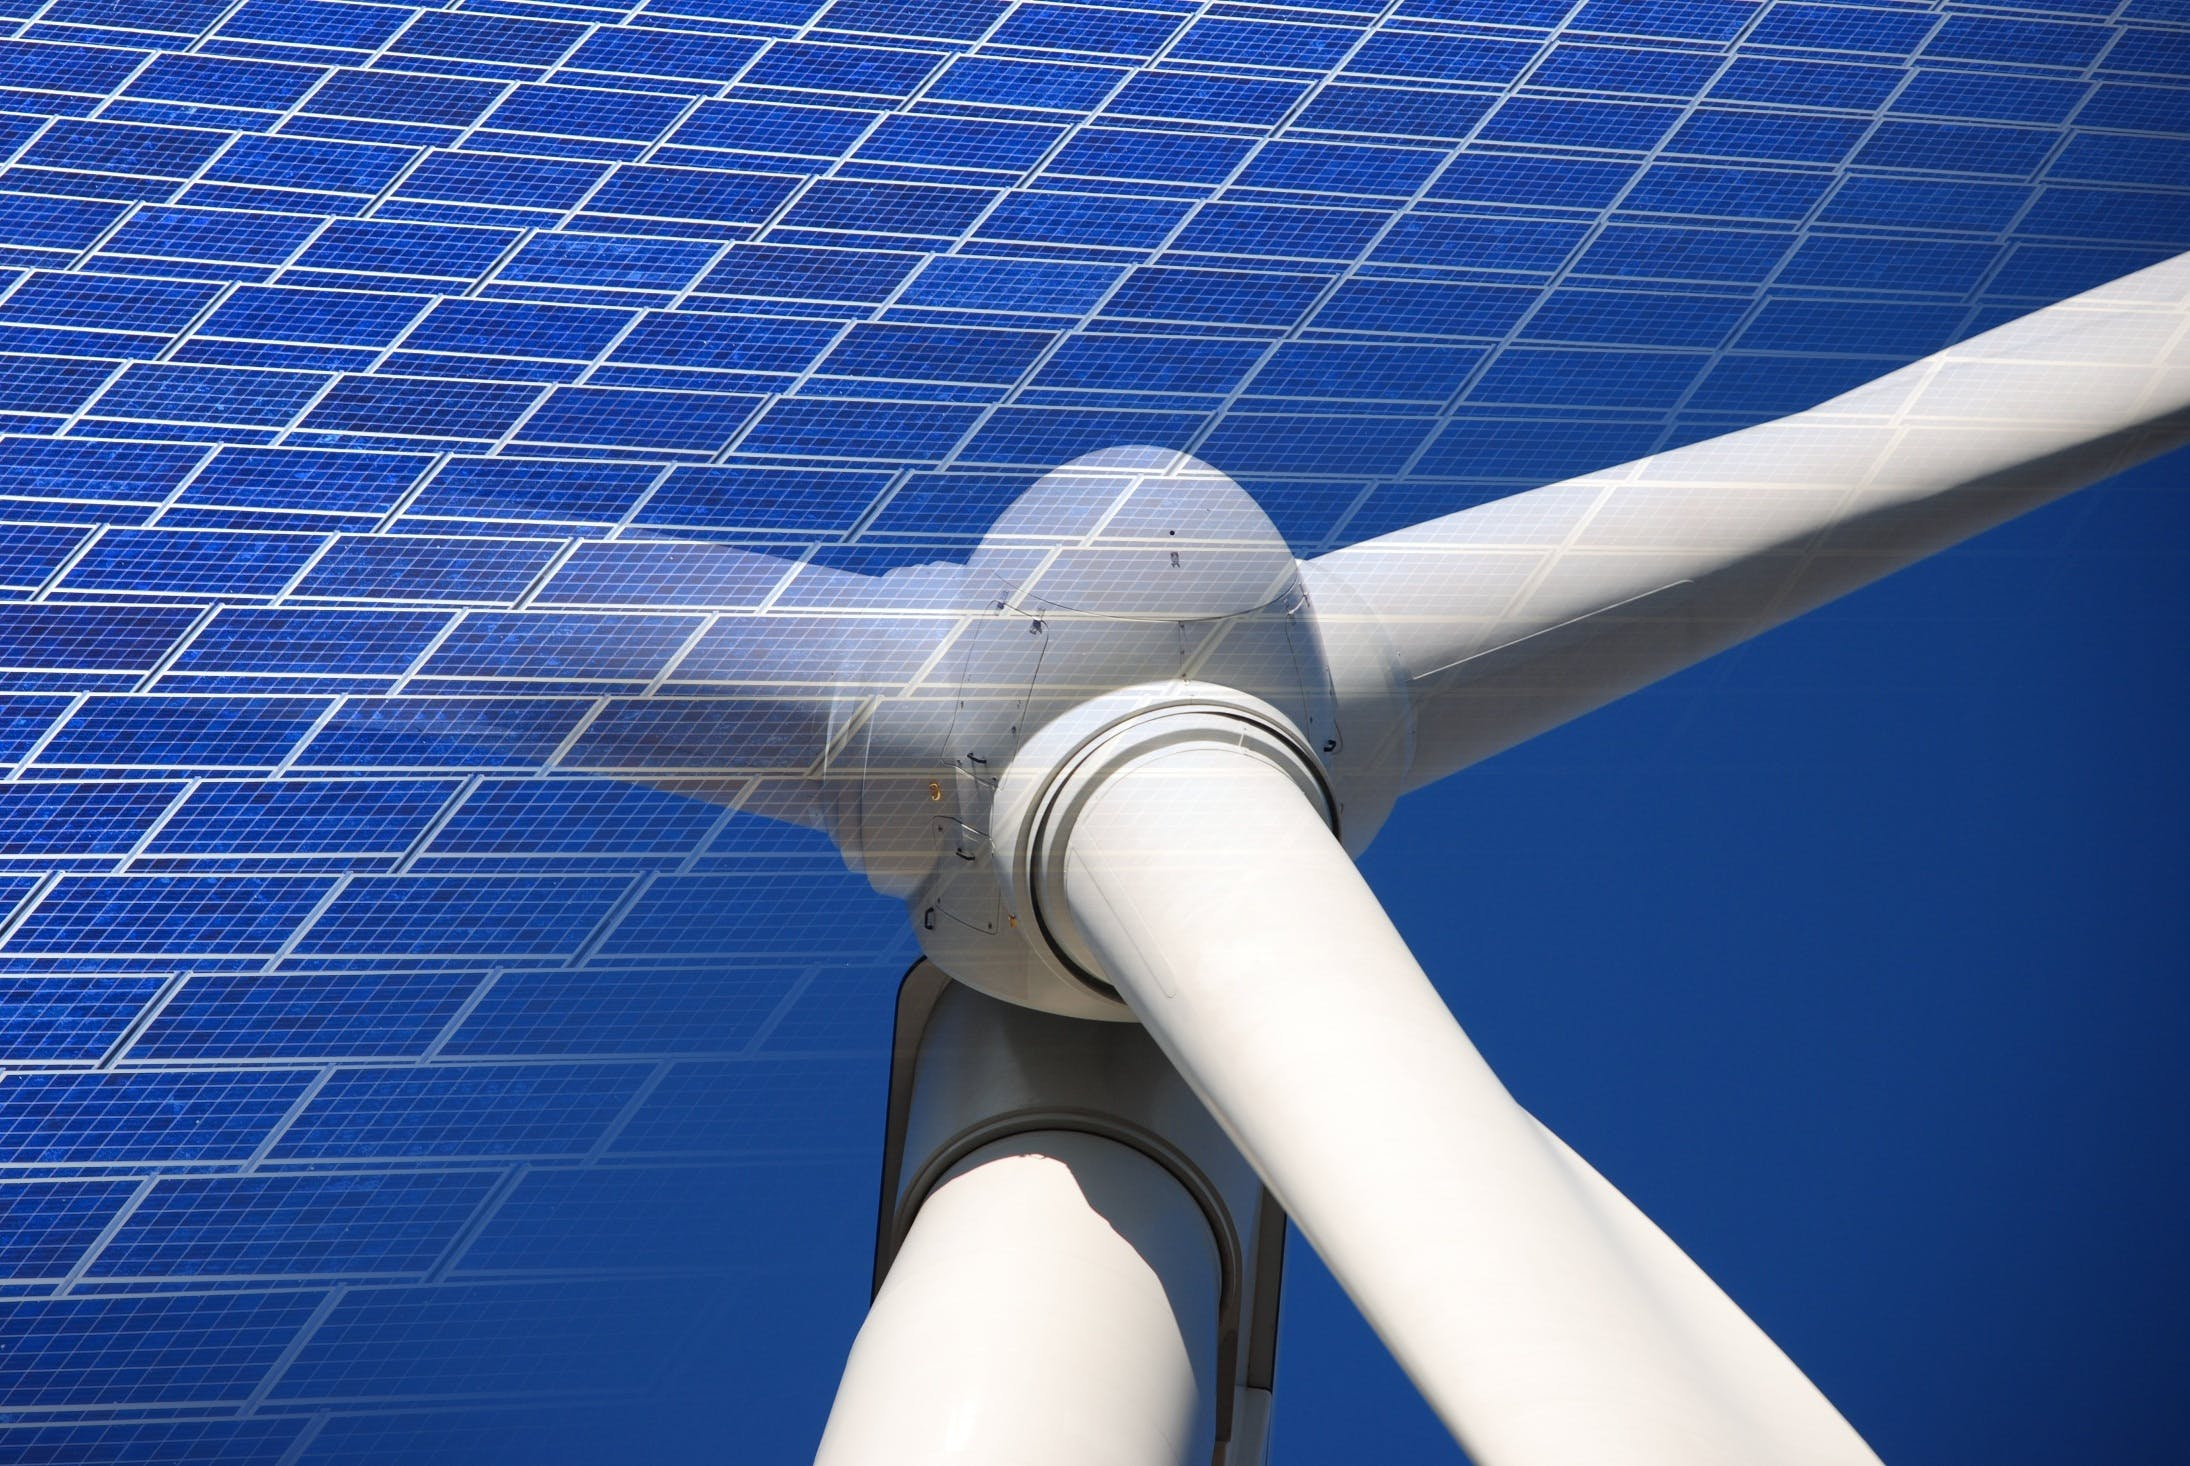 Free stock photo of sun, technology, power, environment